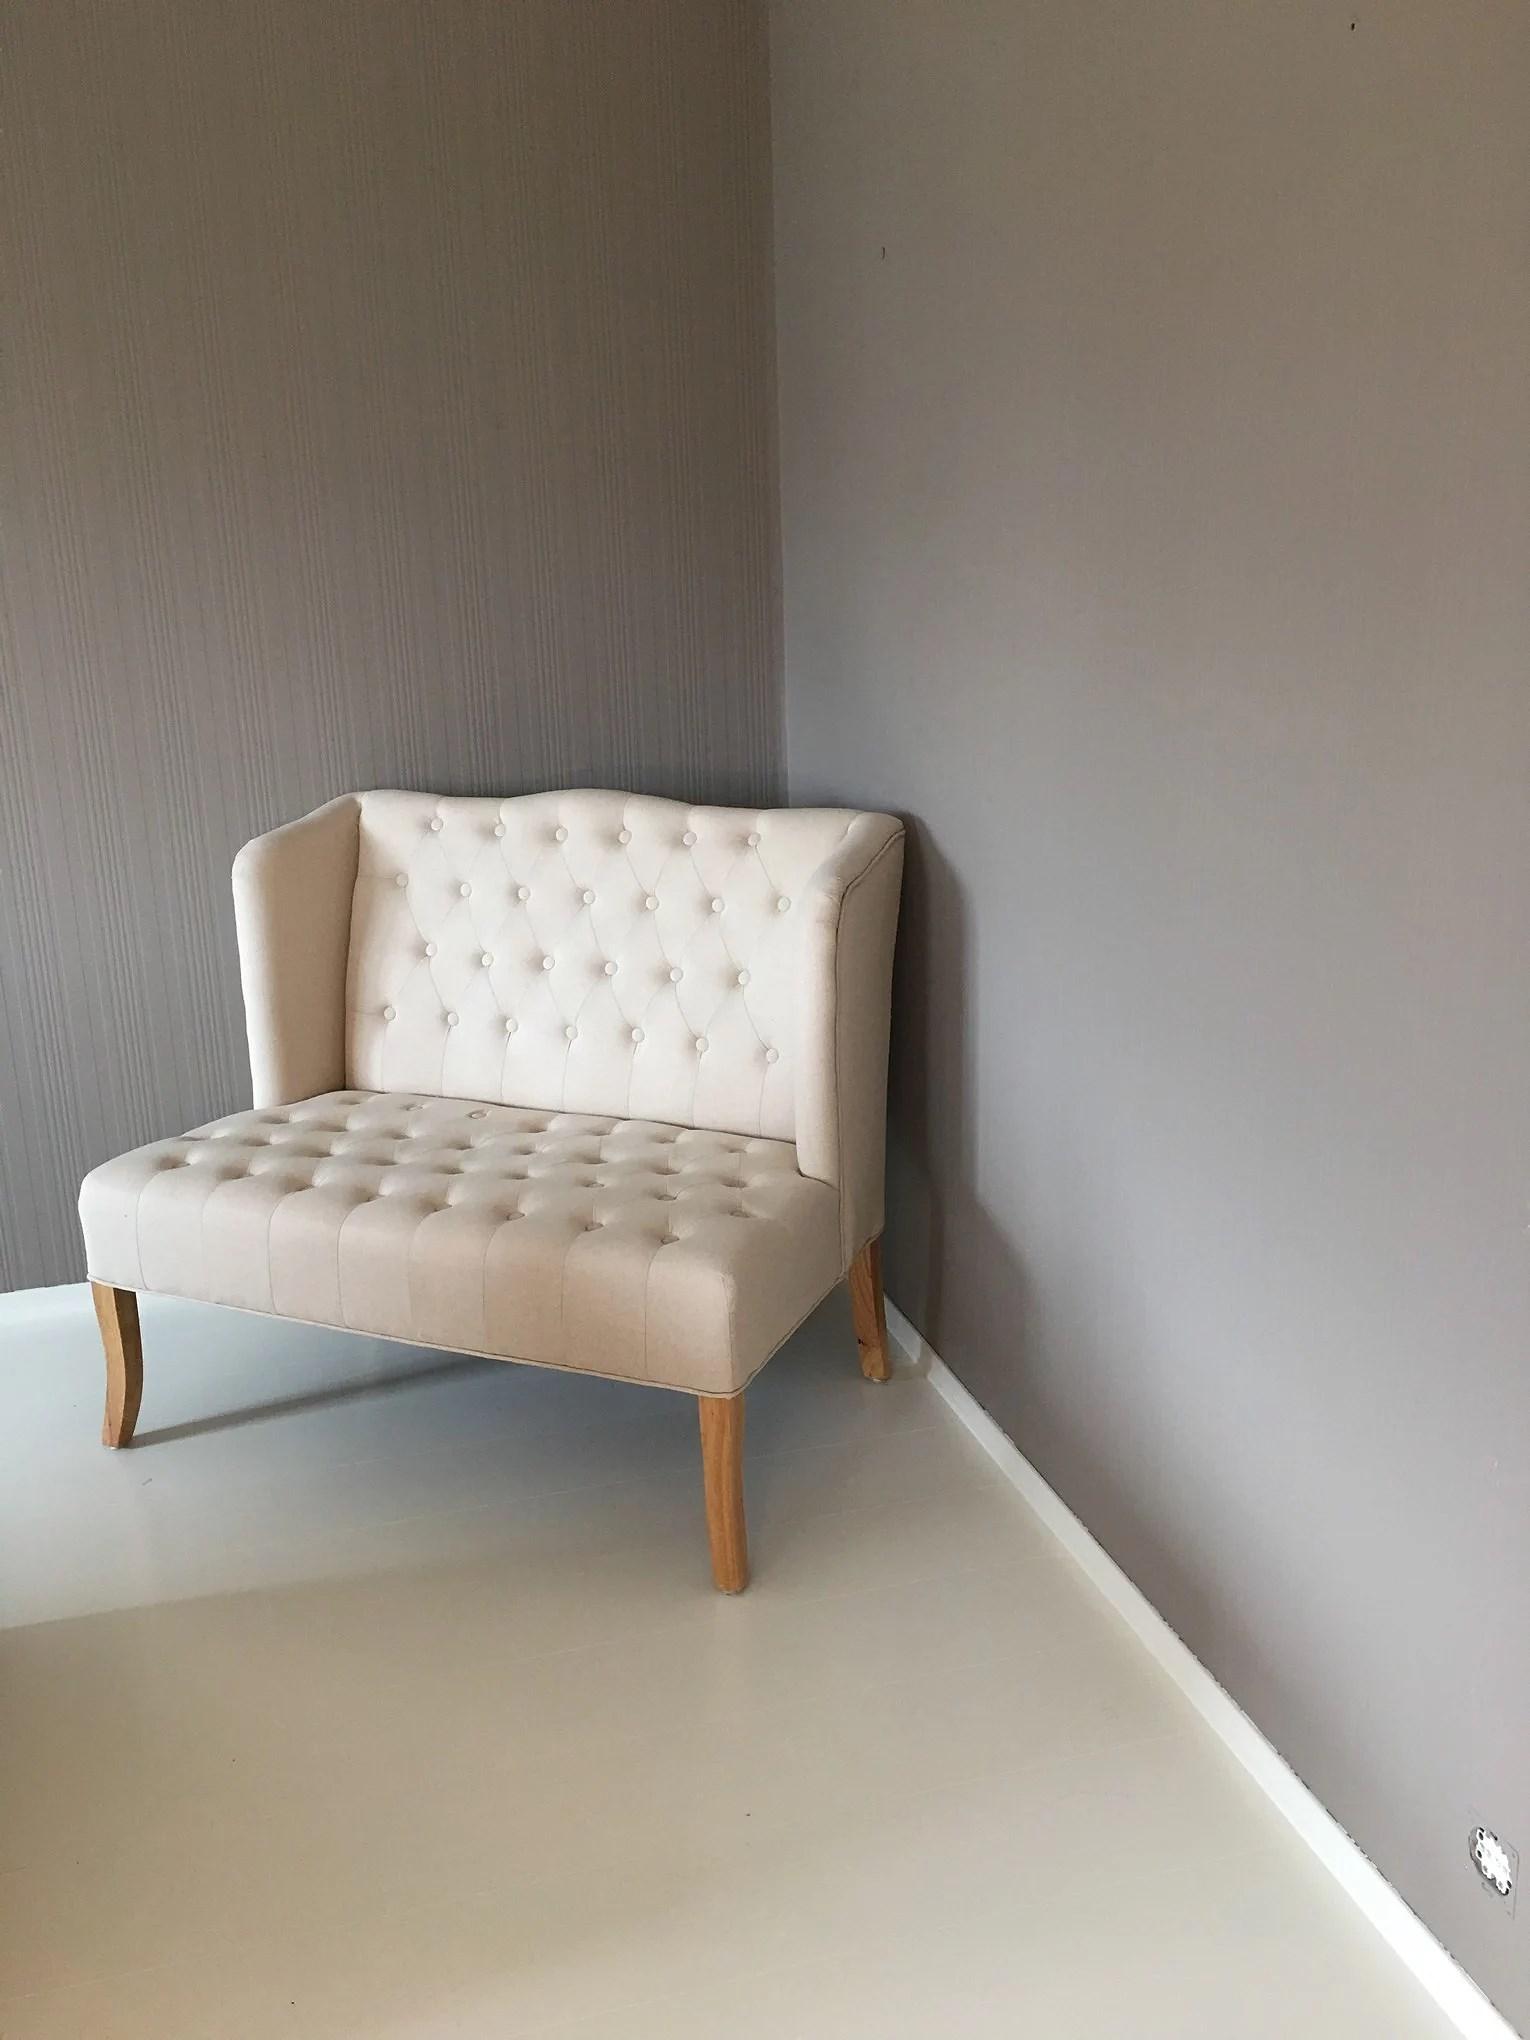 Prosjekt: nye sofabein på 1-2-3